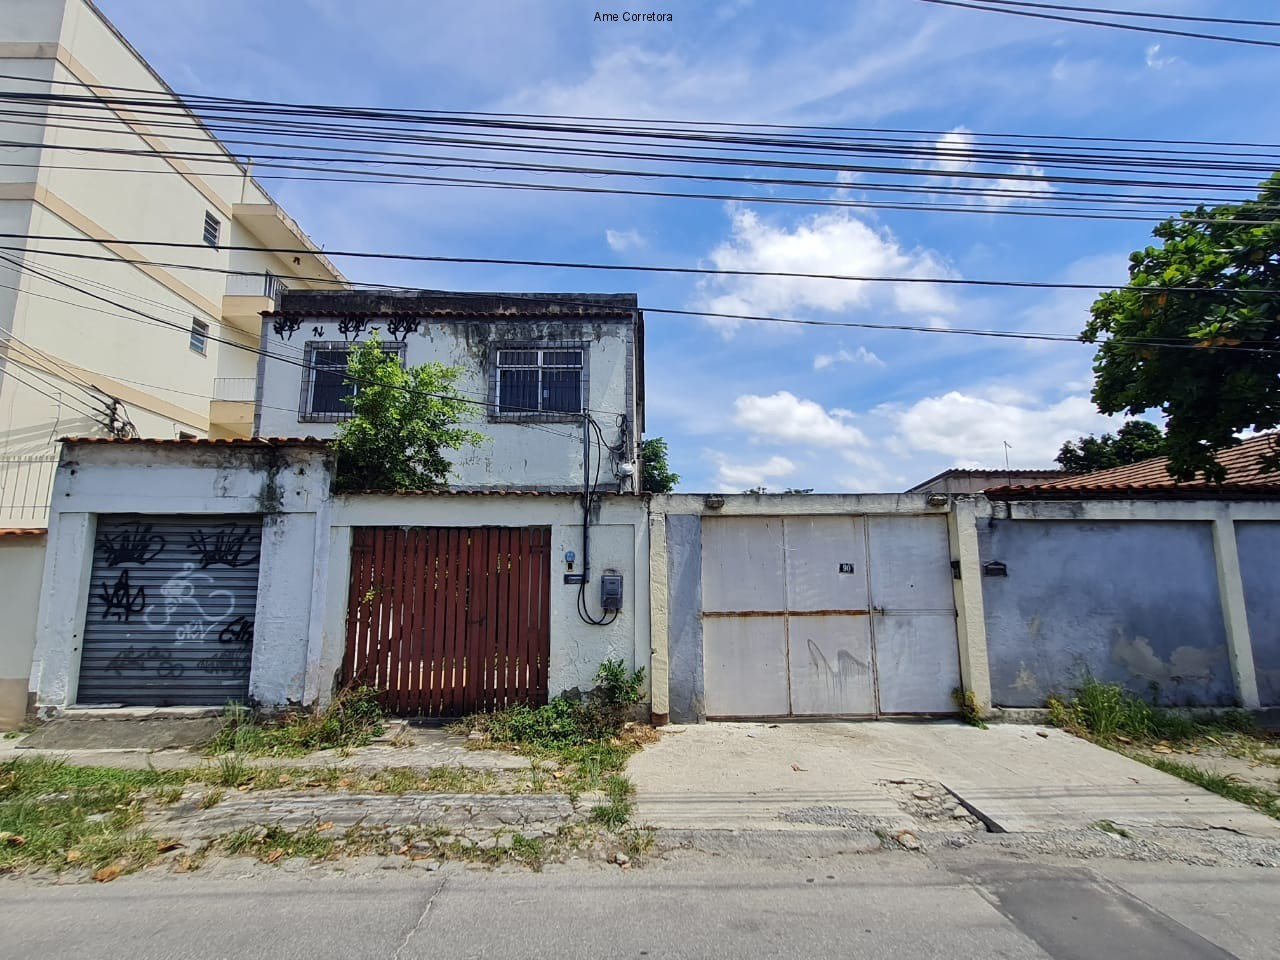 FOTO 07 - Terreno à venda Bangu, Rio de Janeiro - R$ 1.300.000 - TE00066 - 1